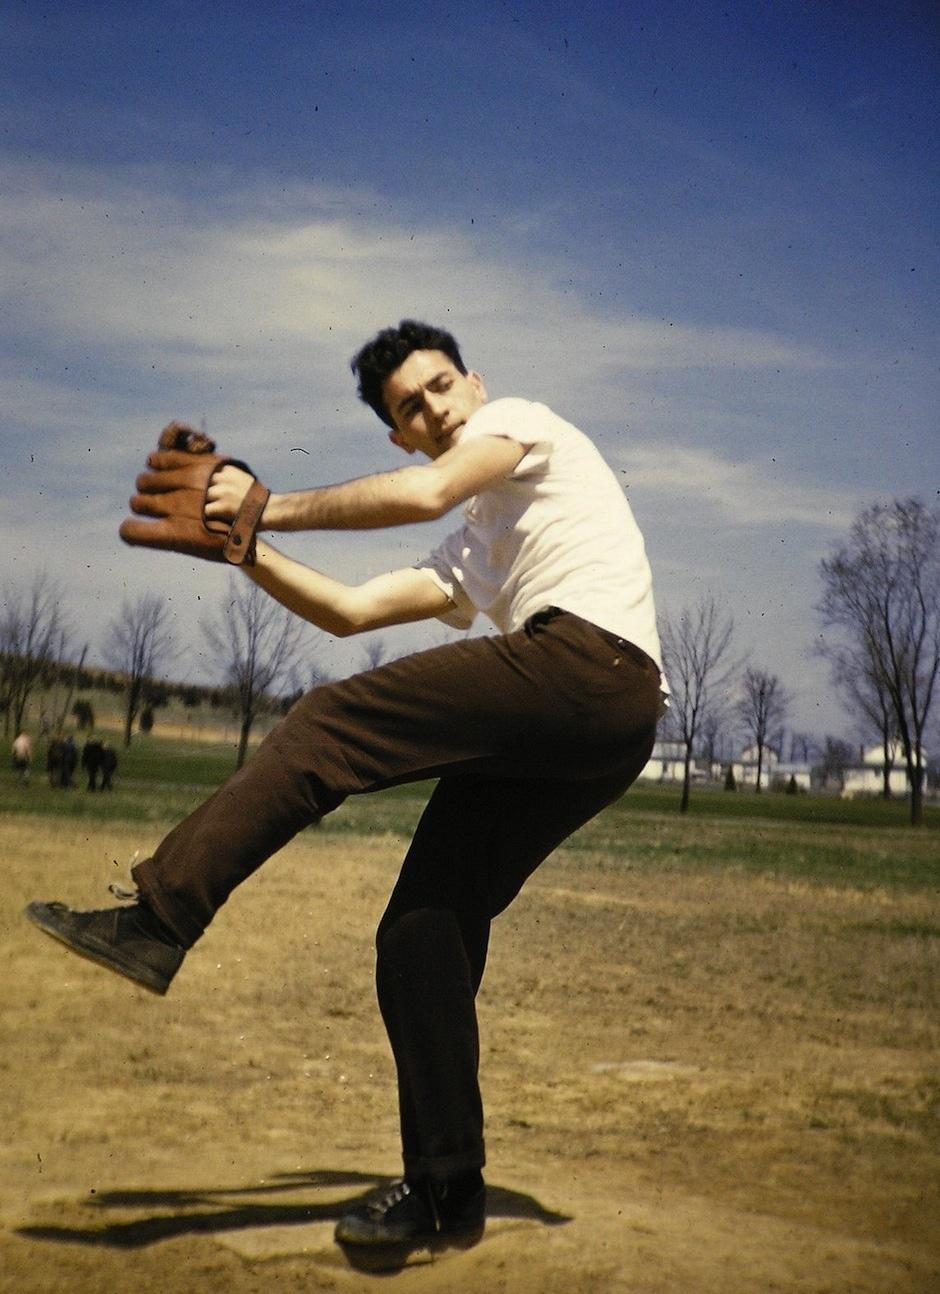 082010_pitcher_940.jpg